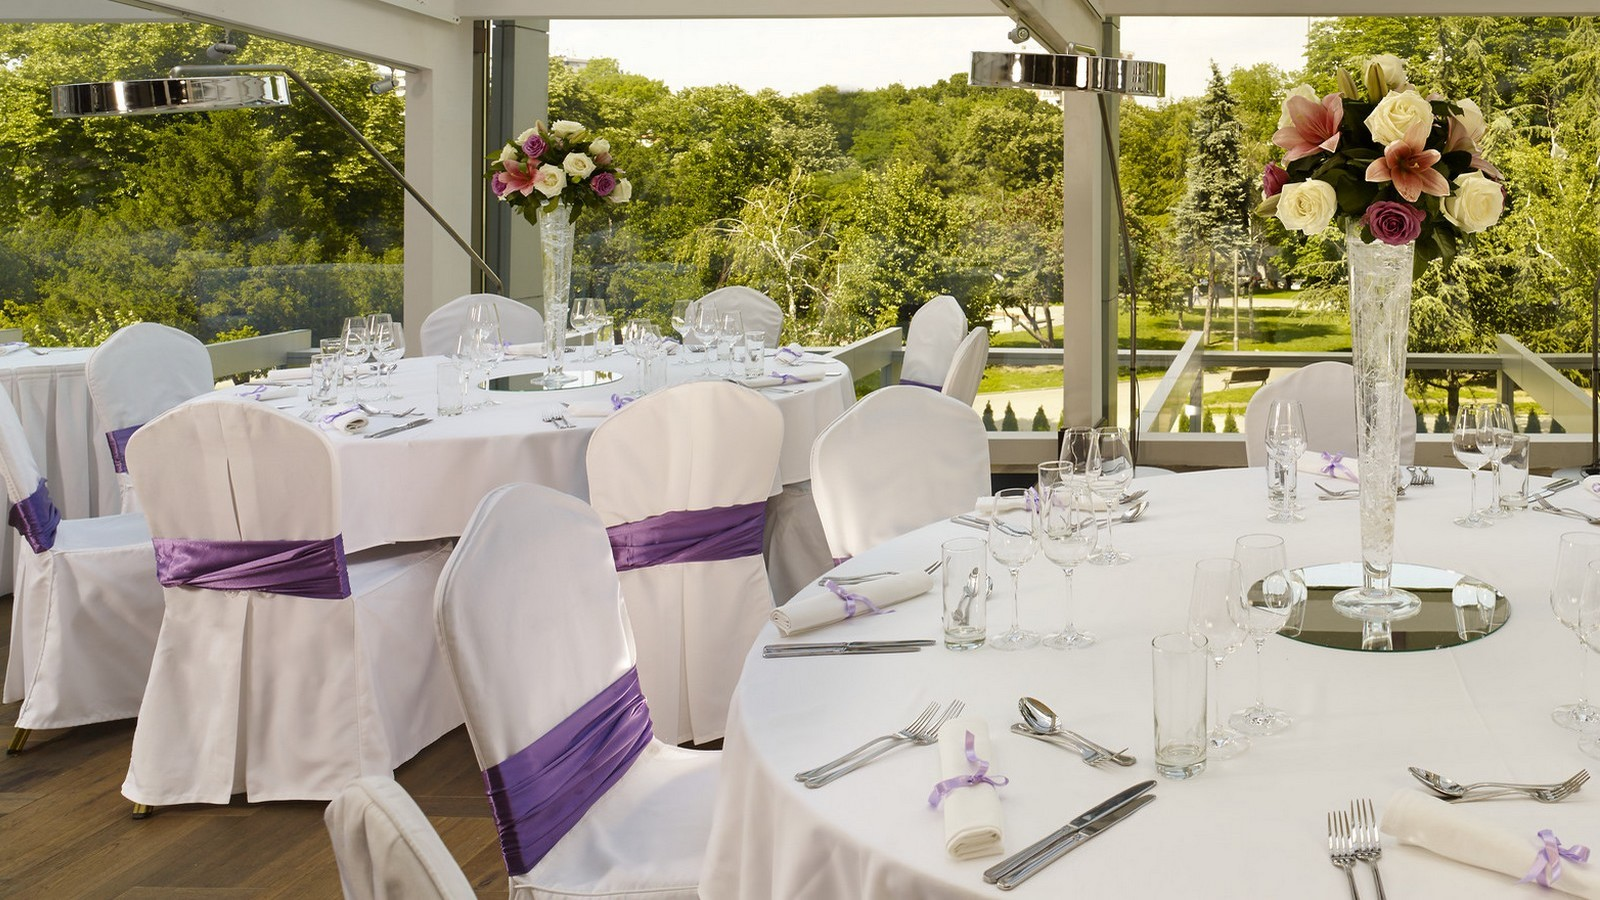 Choosing A Wedding Venue 5 Tips